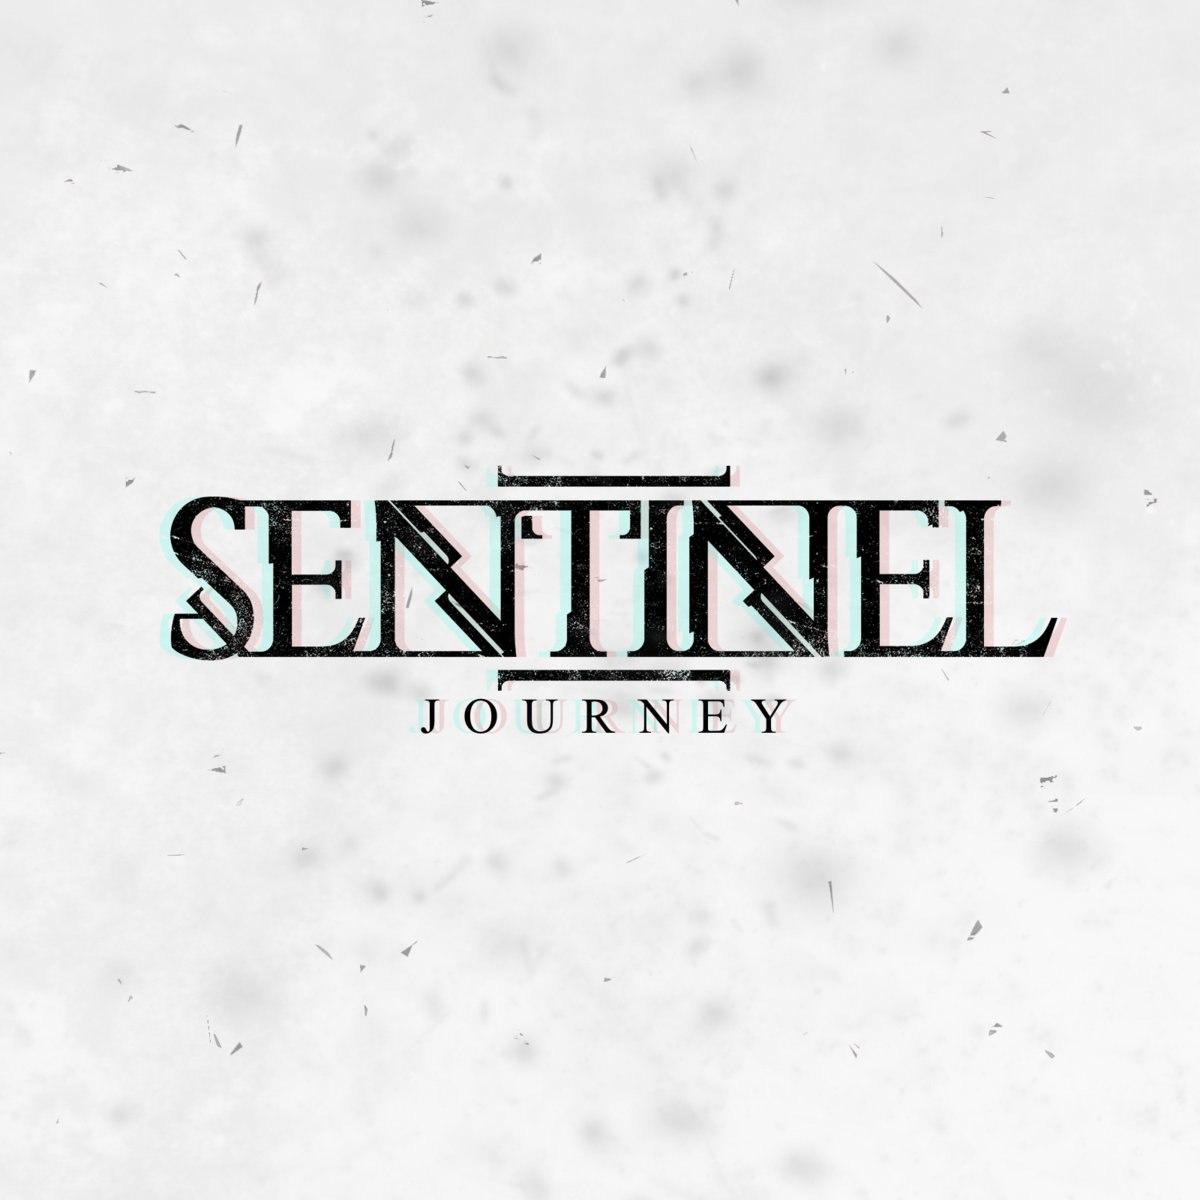 Sentinel - Journey [single] (2016)